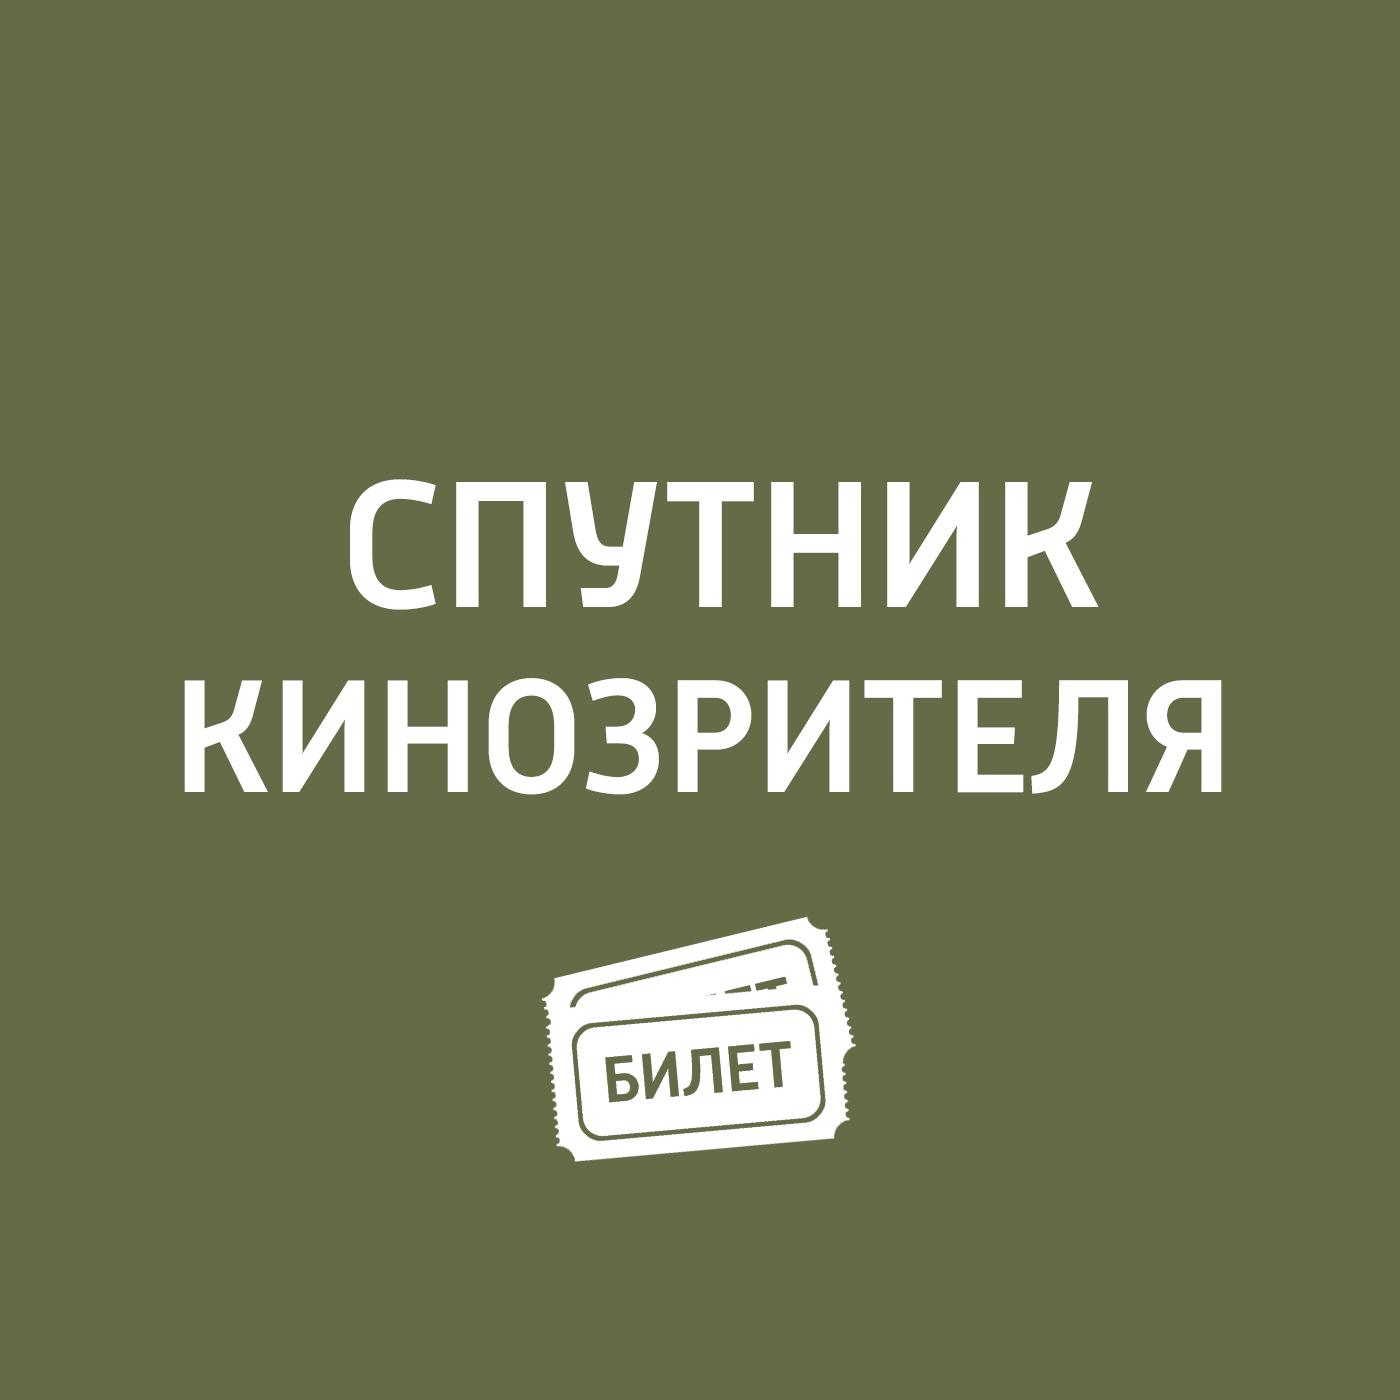 Антон Долин Киносказки вчера и сегодня цена 2017